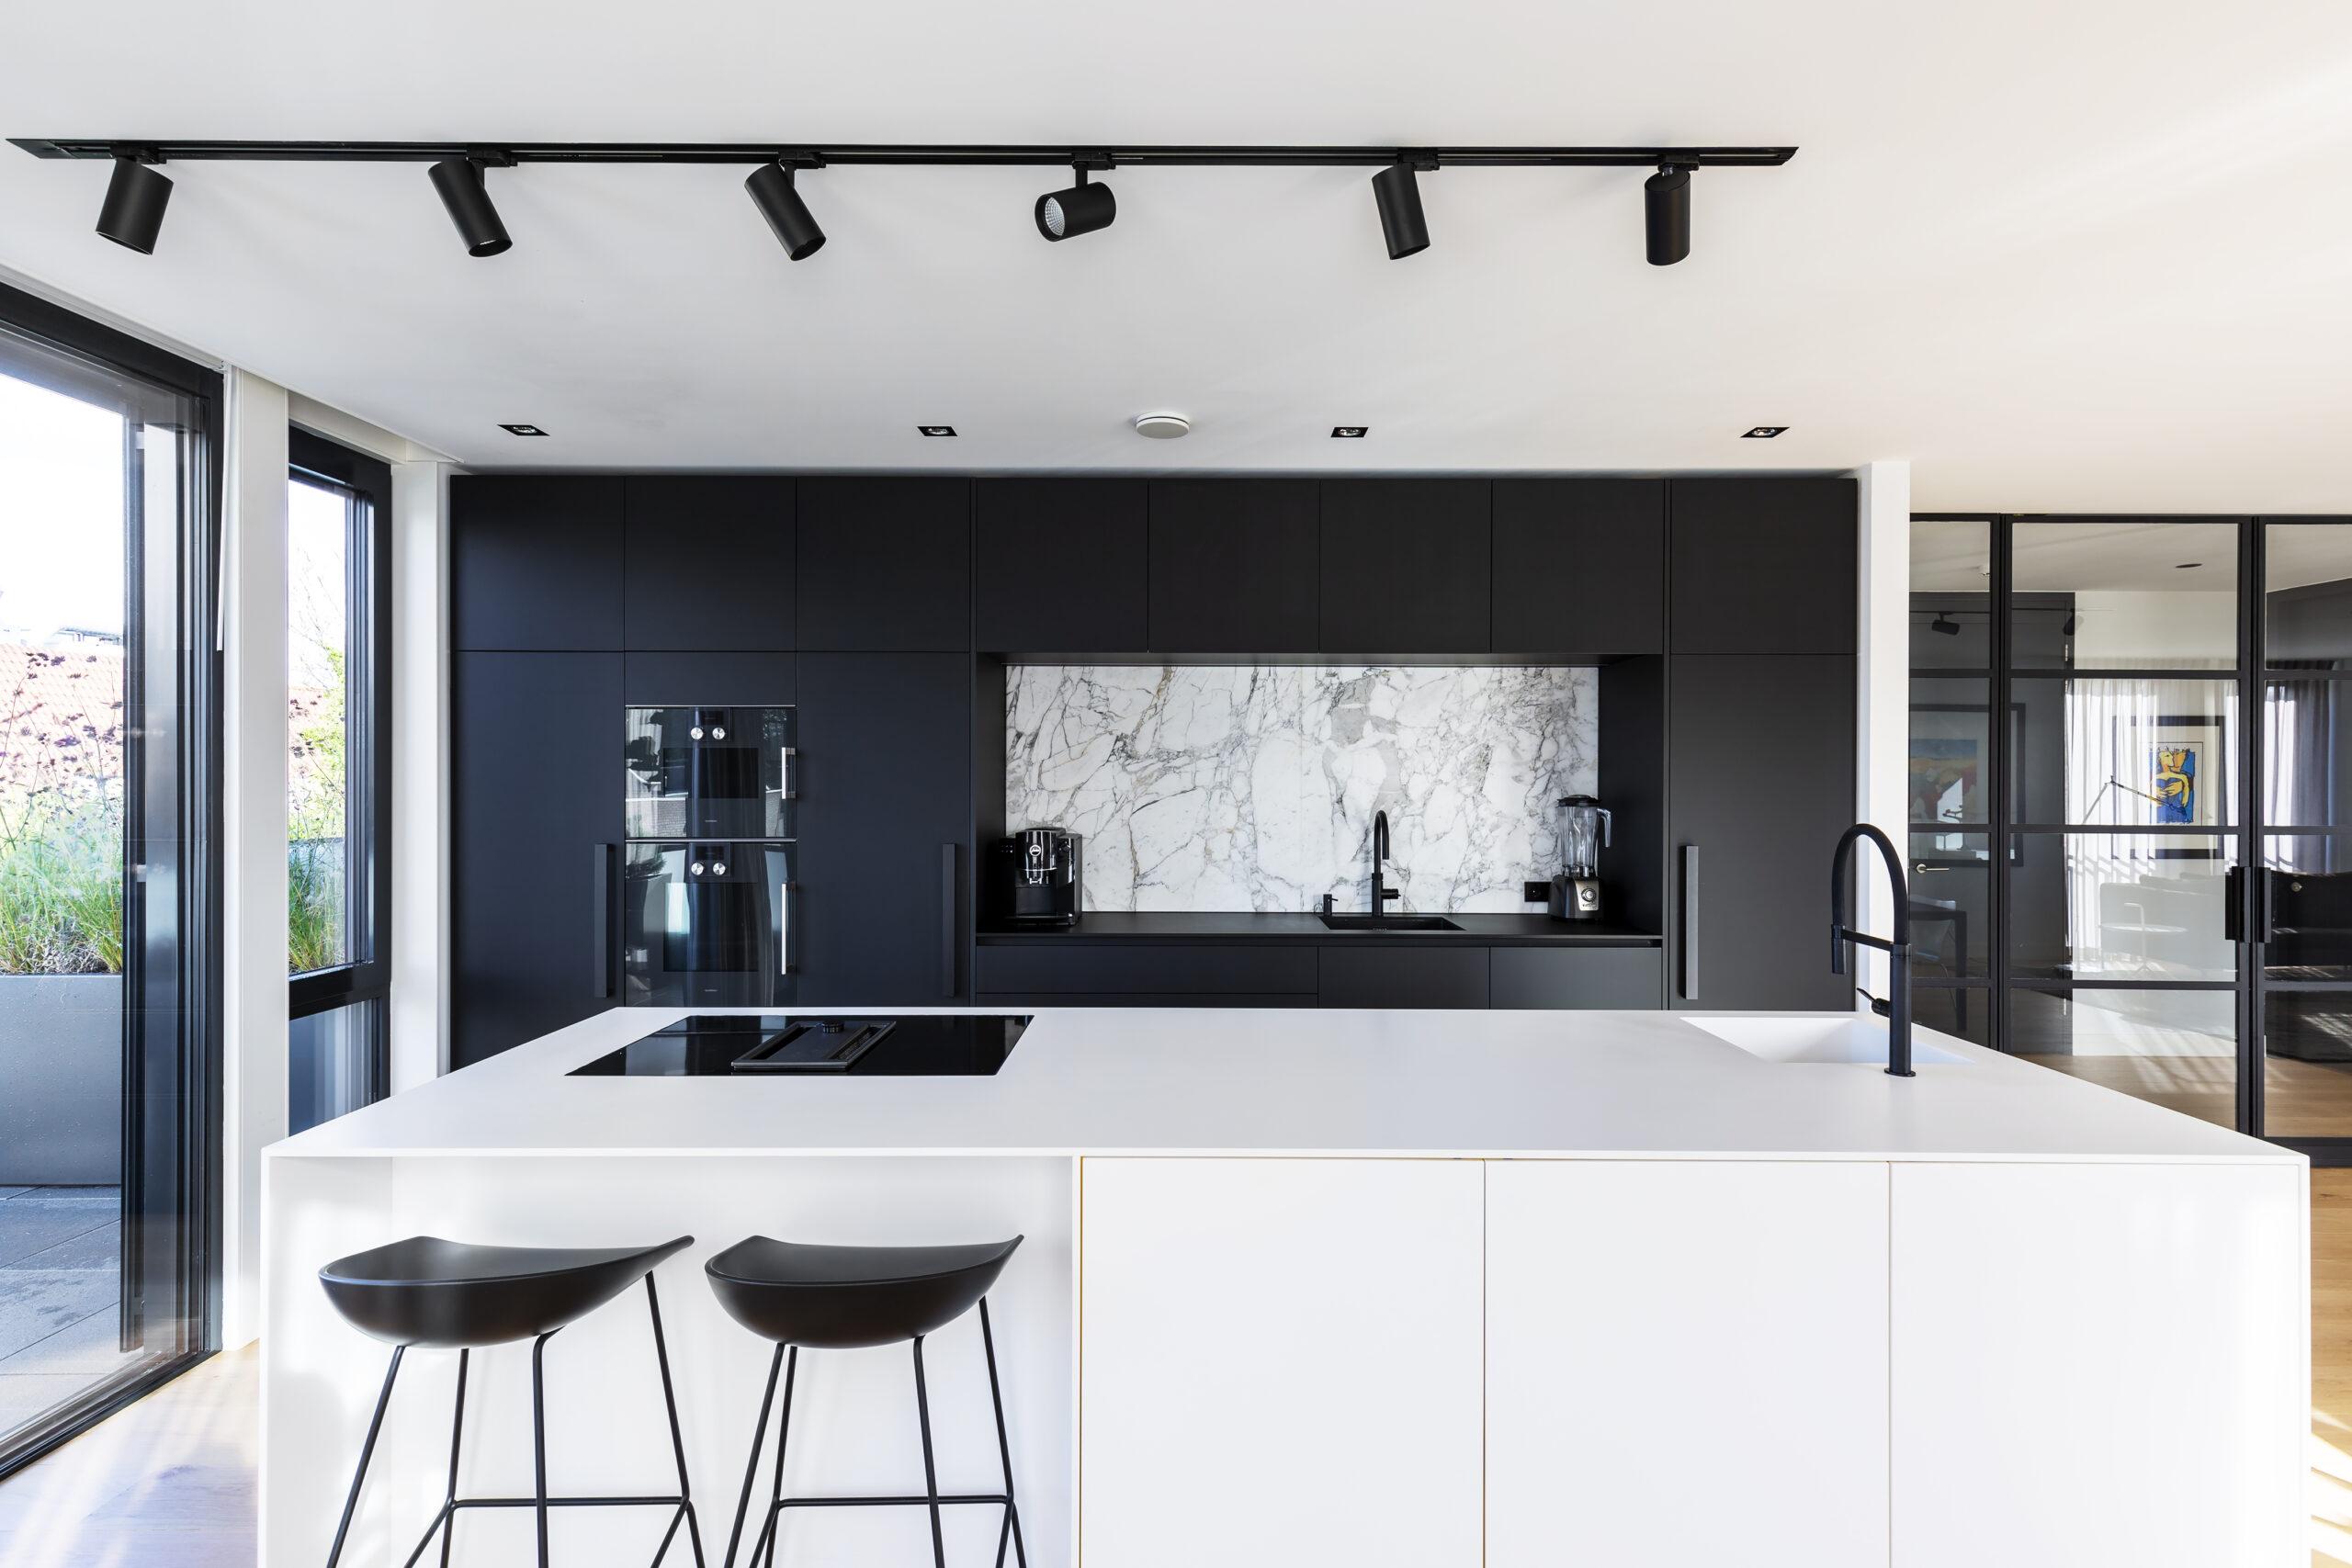 vink_interieurontwerp_keuken_purmerend